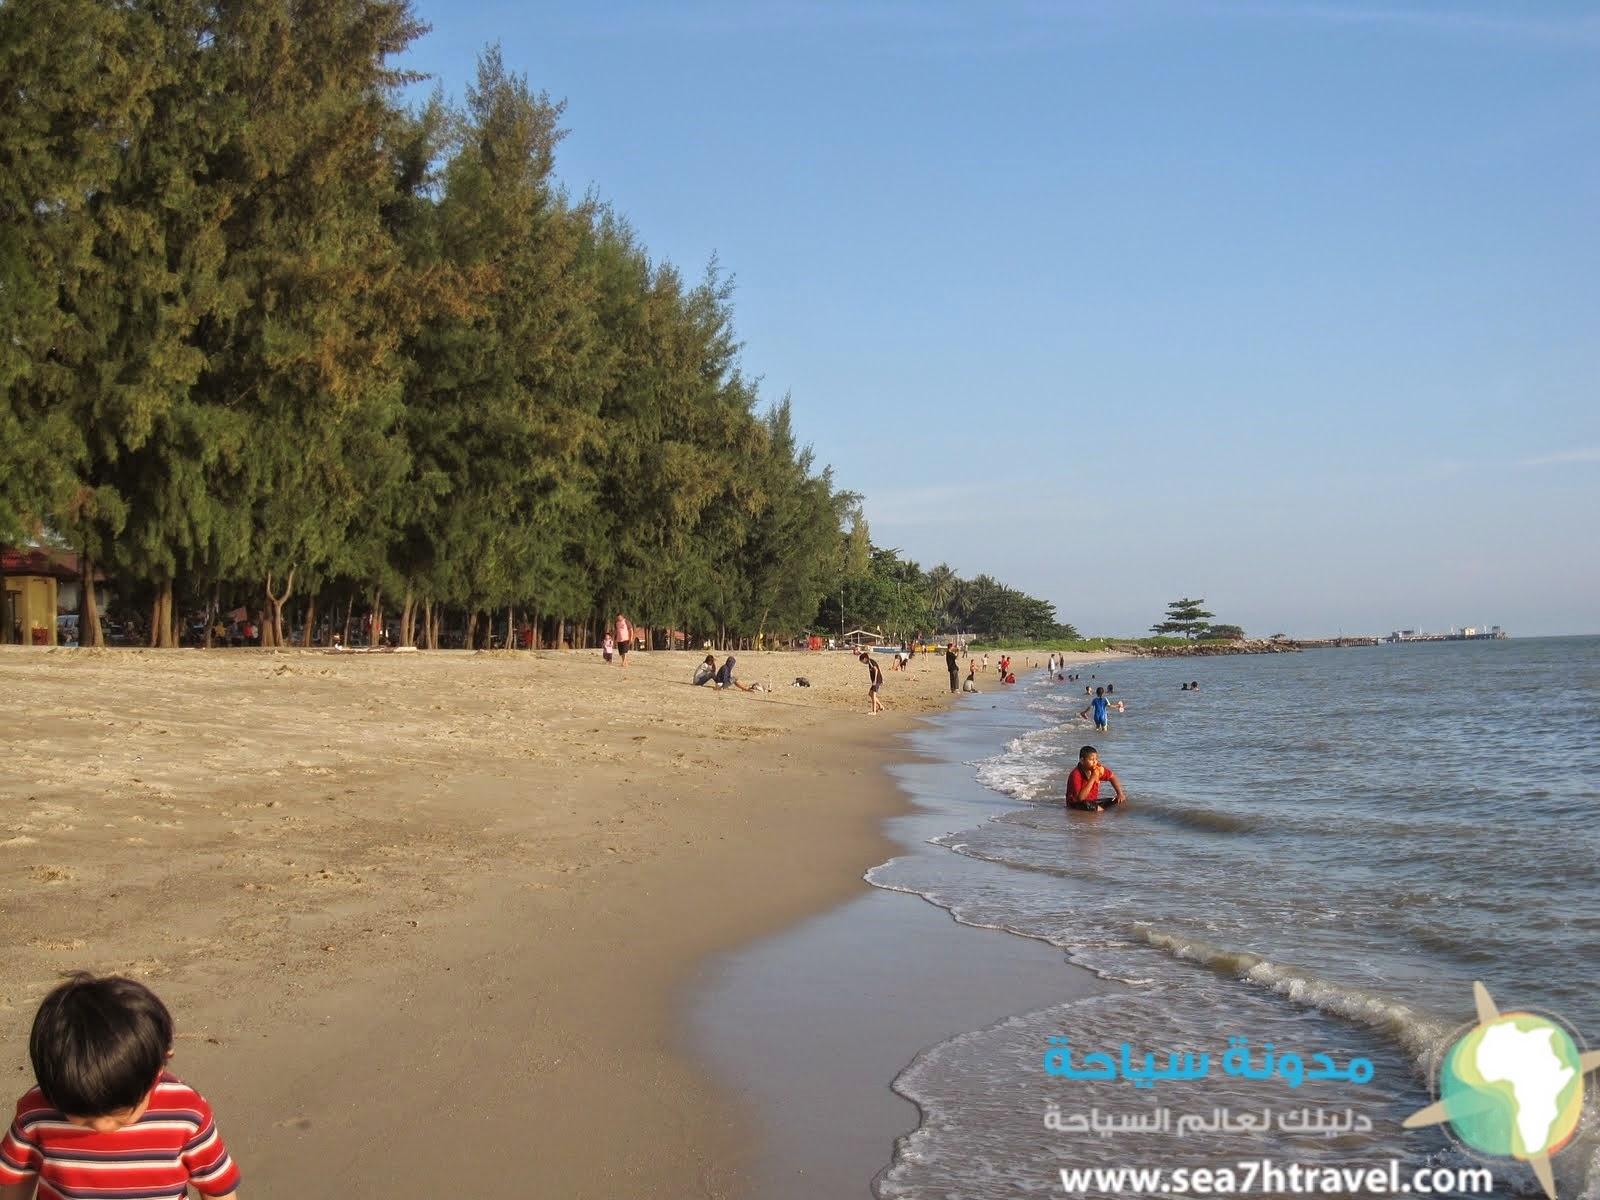 كليبانج ملاكا شواطئ السحر